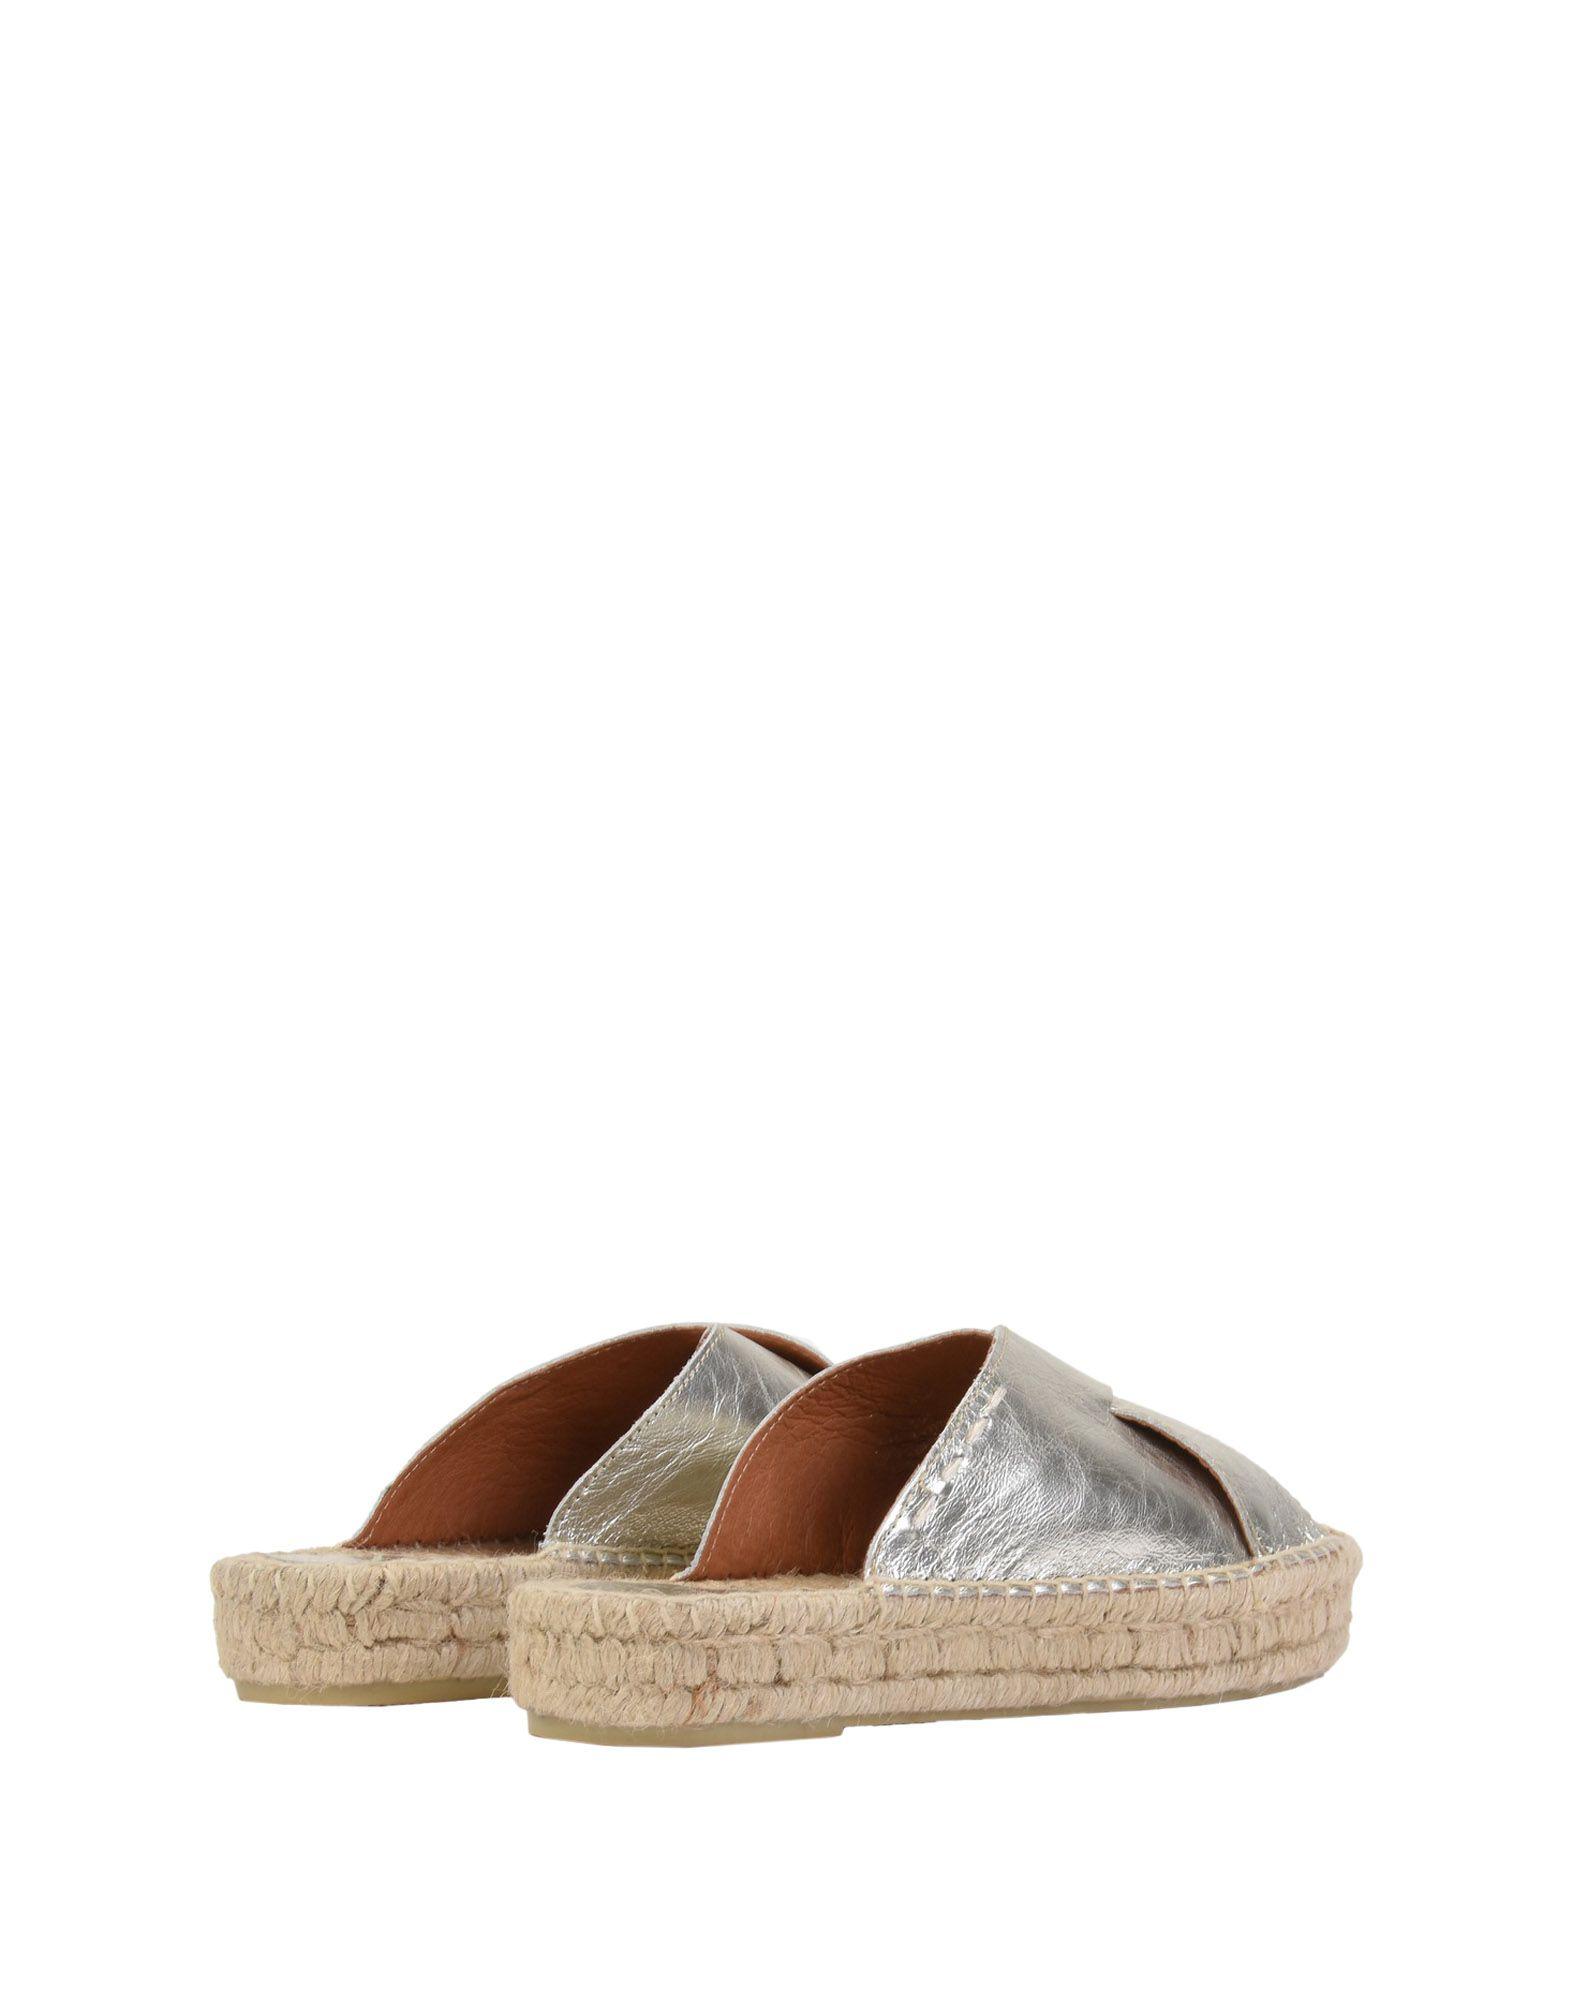 Free 11502177QI People Tuscan Slip On Espadrille  11502177QI Free Gute Qualität beliebte Schuhe 62f7c6